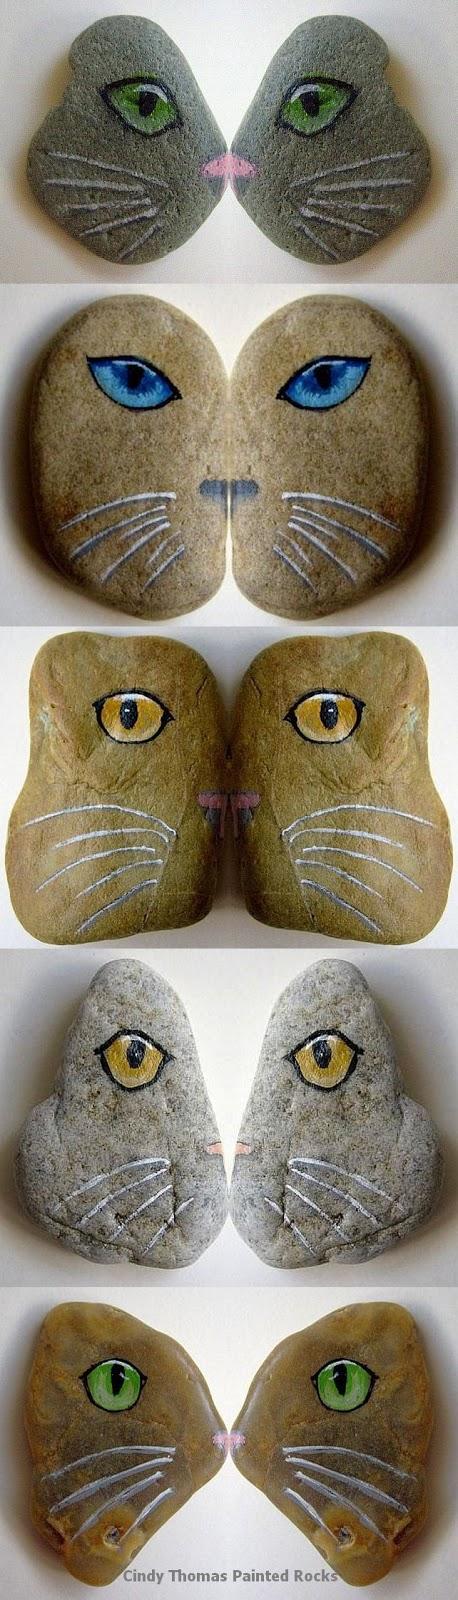 painted rocks, cats, kitties, stones, rock painting, Cindy Thomas